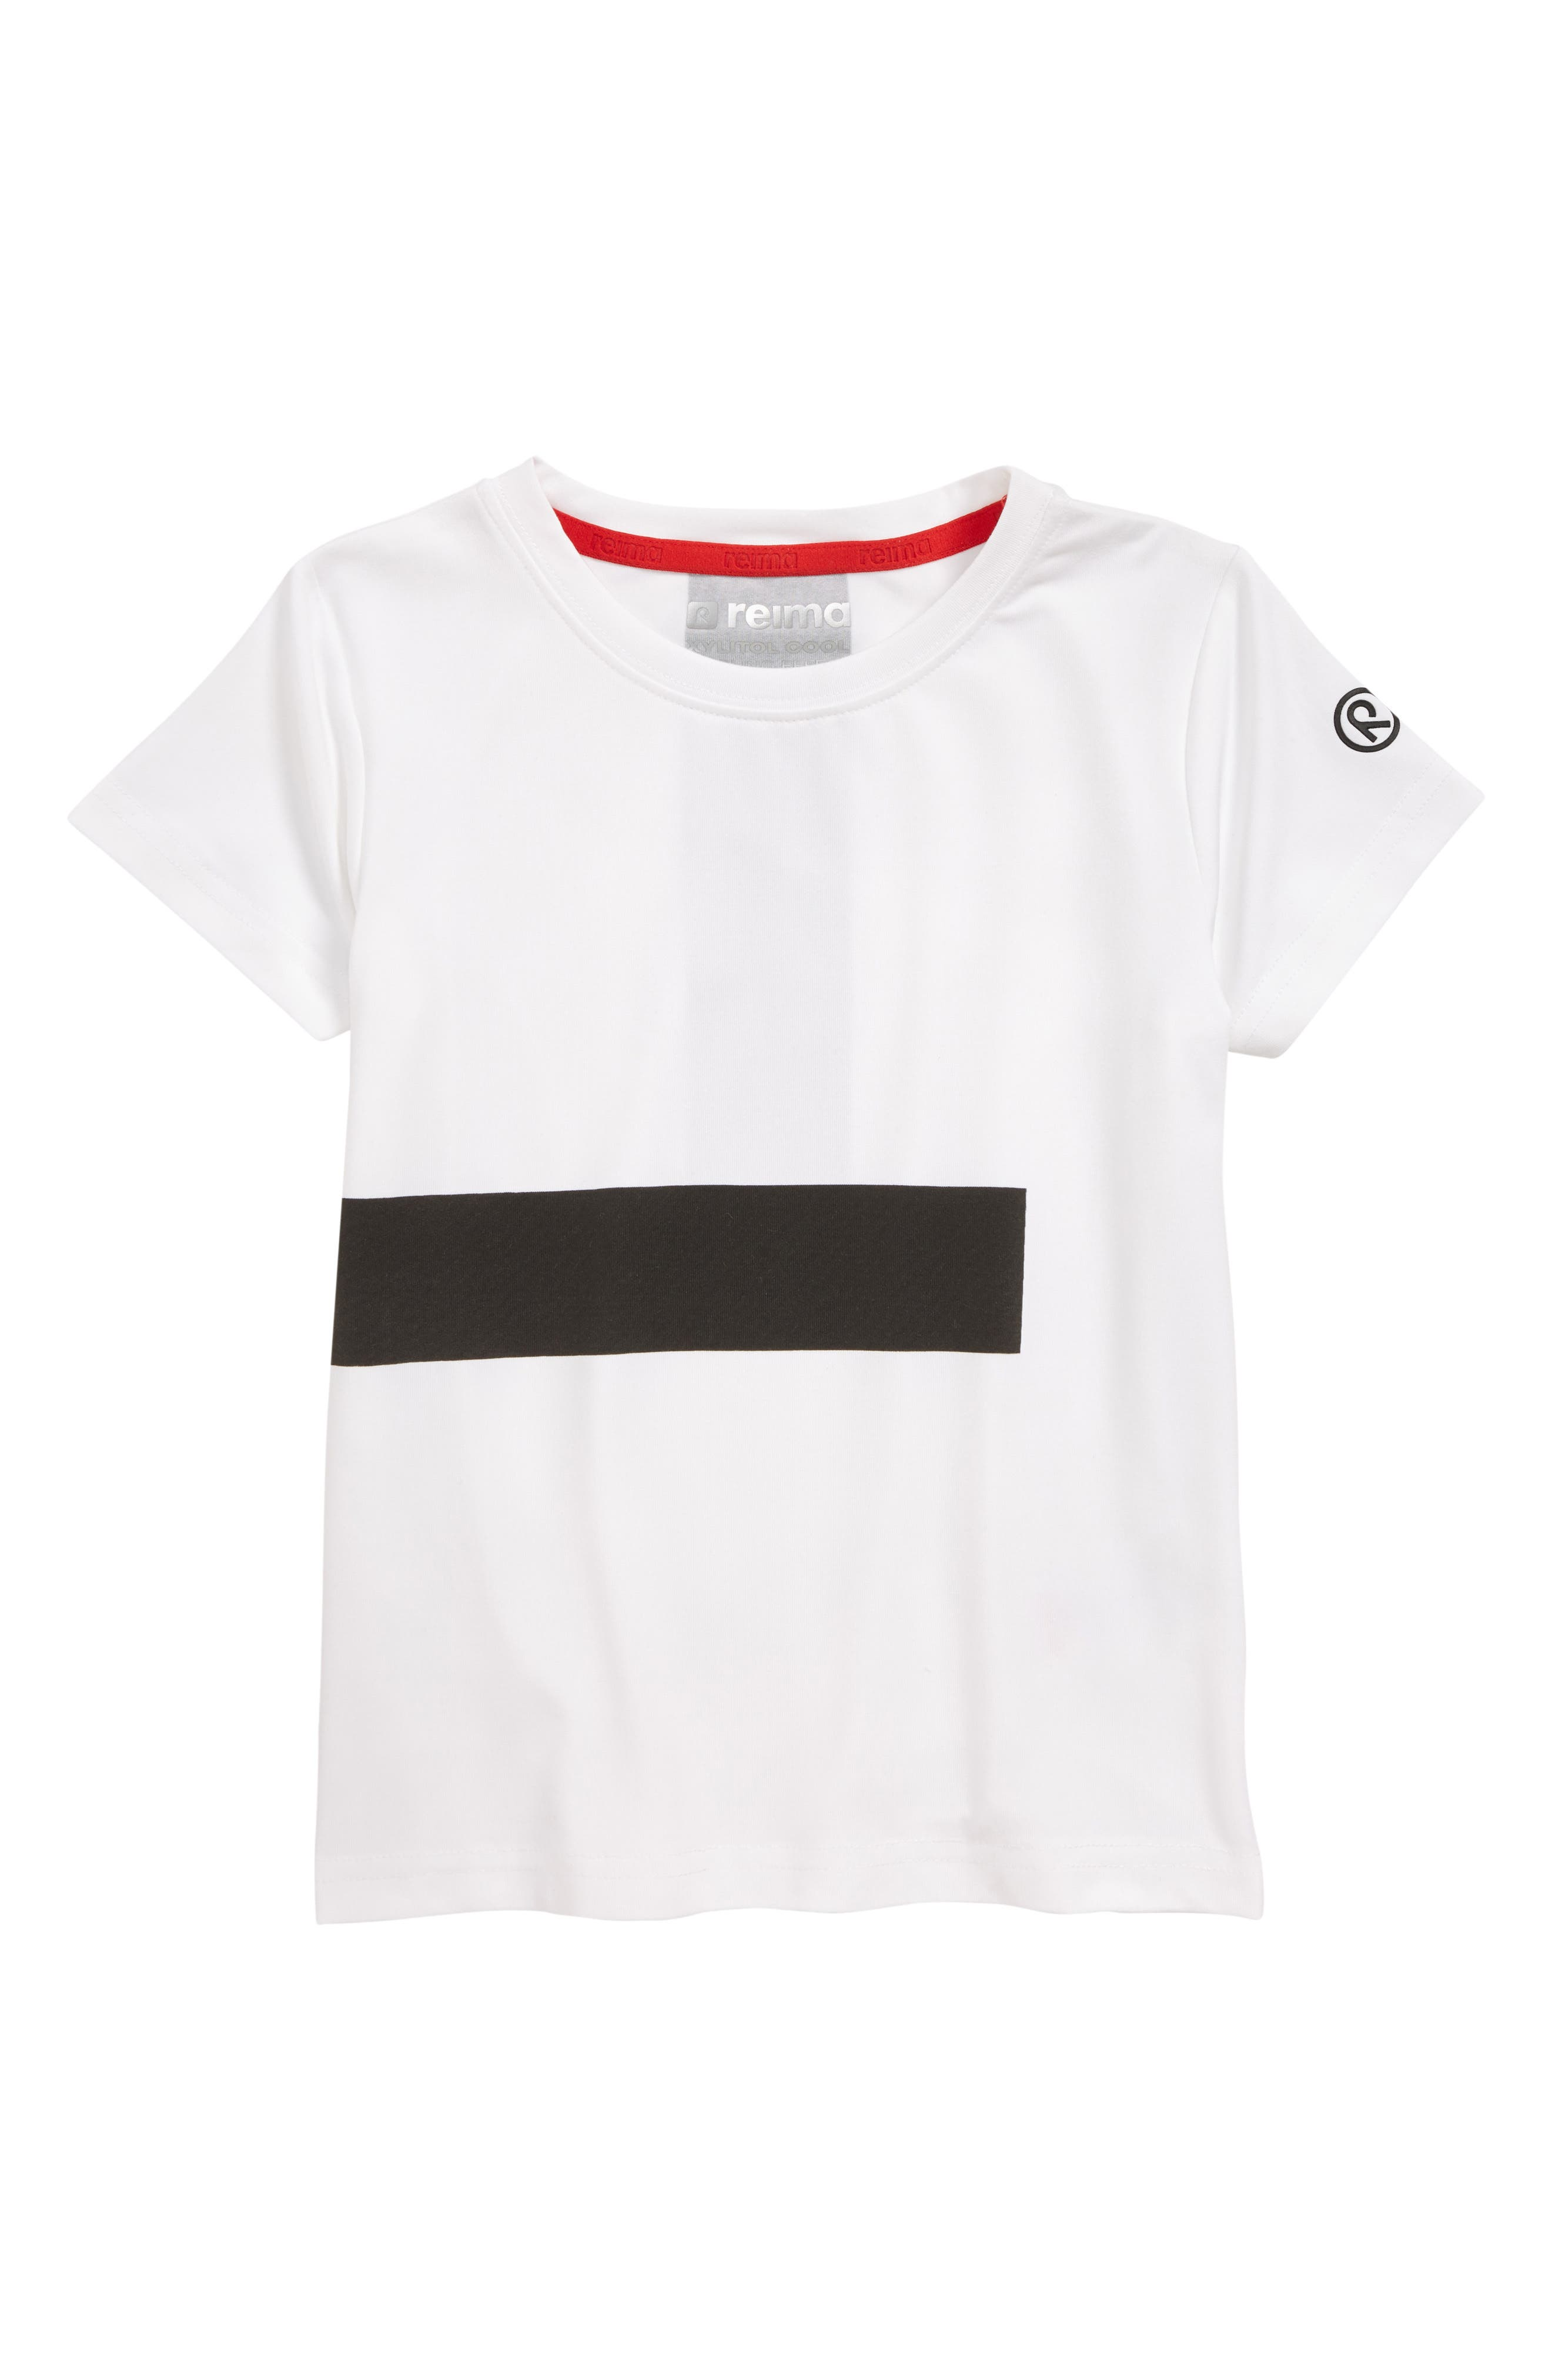 Speeder Cool Tech T-Shirt, Main, color, WHITE